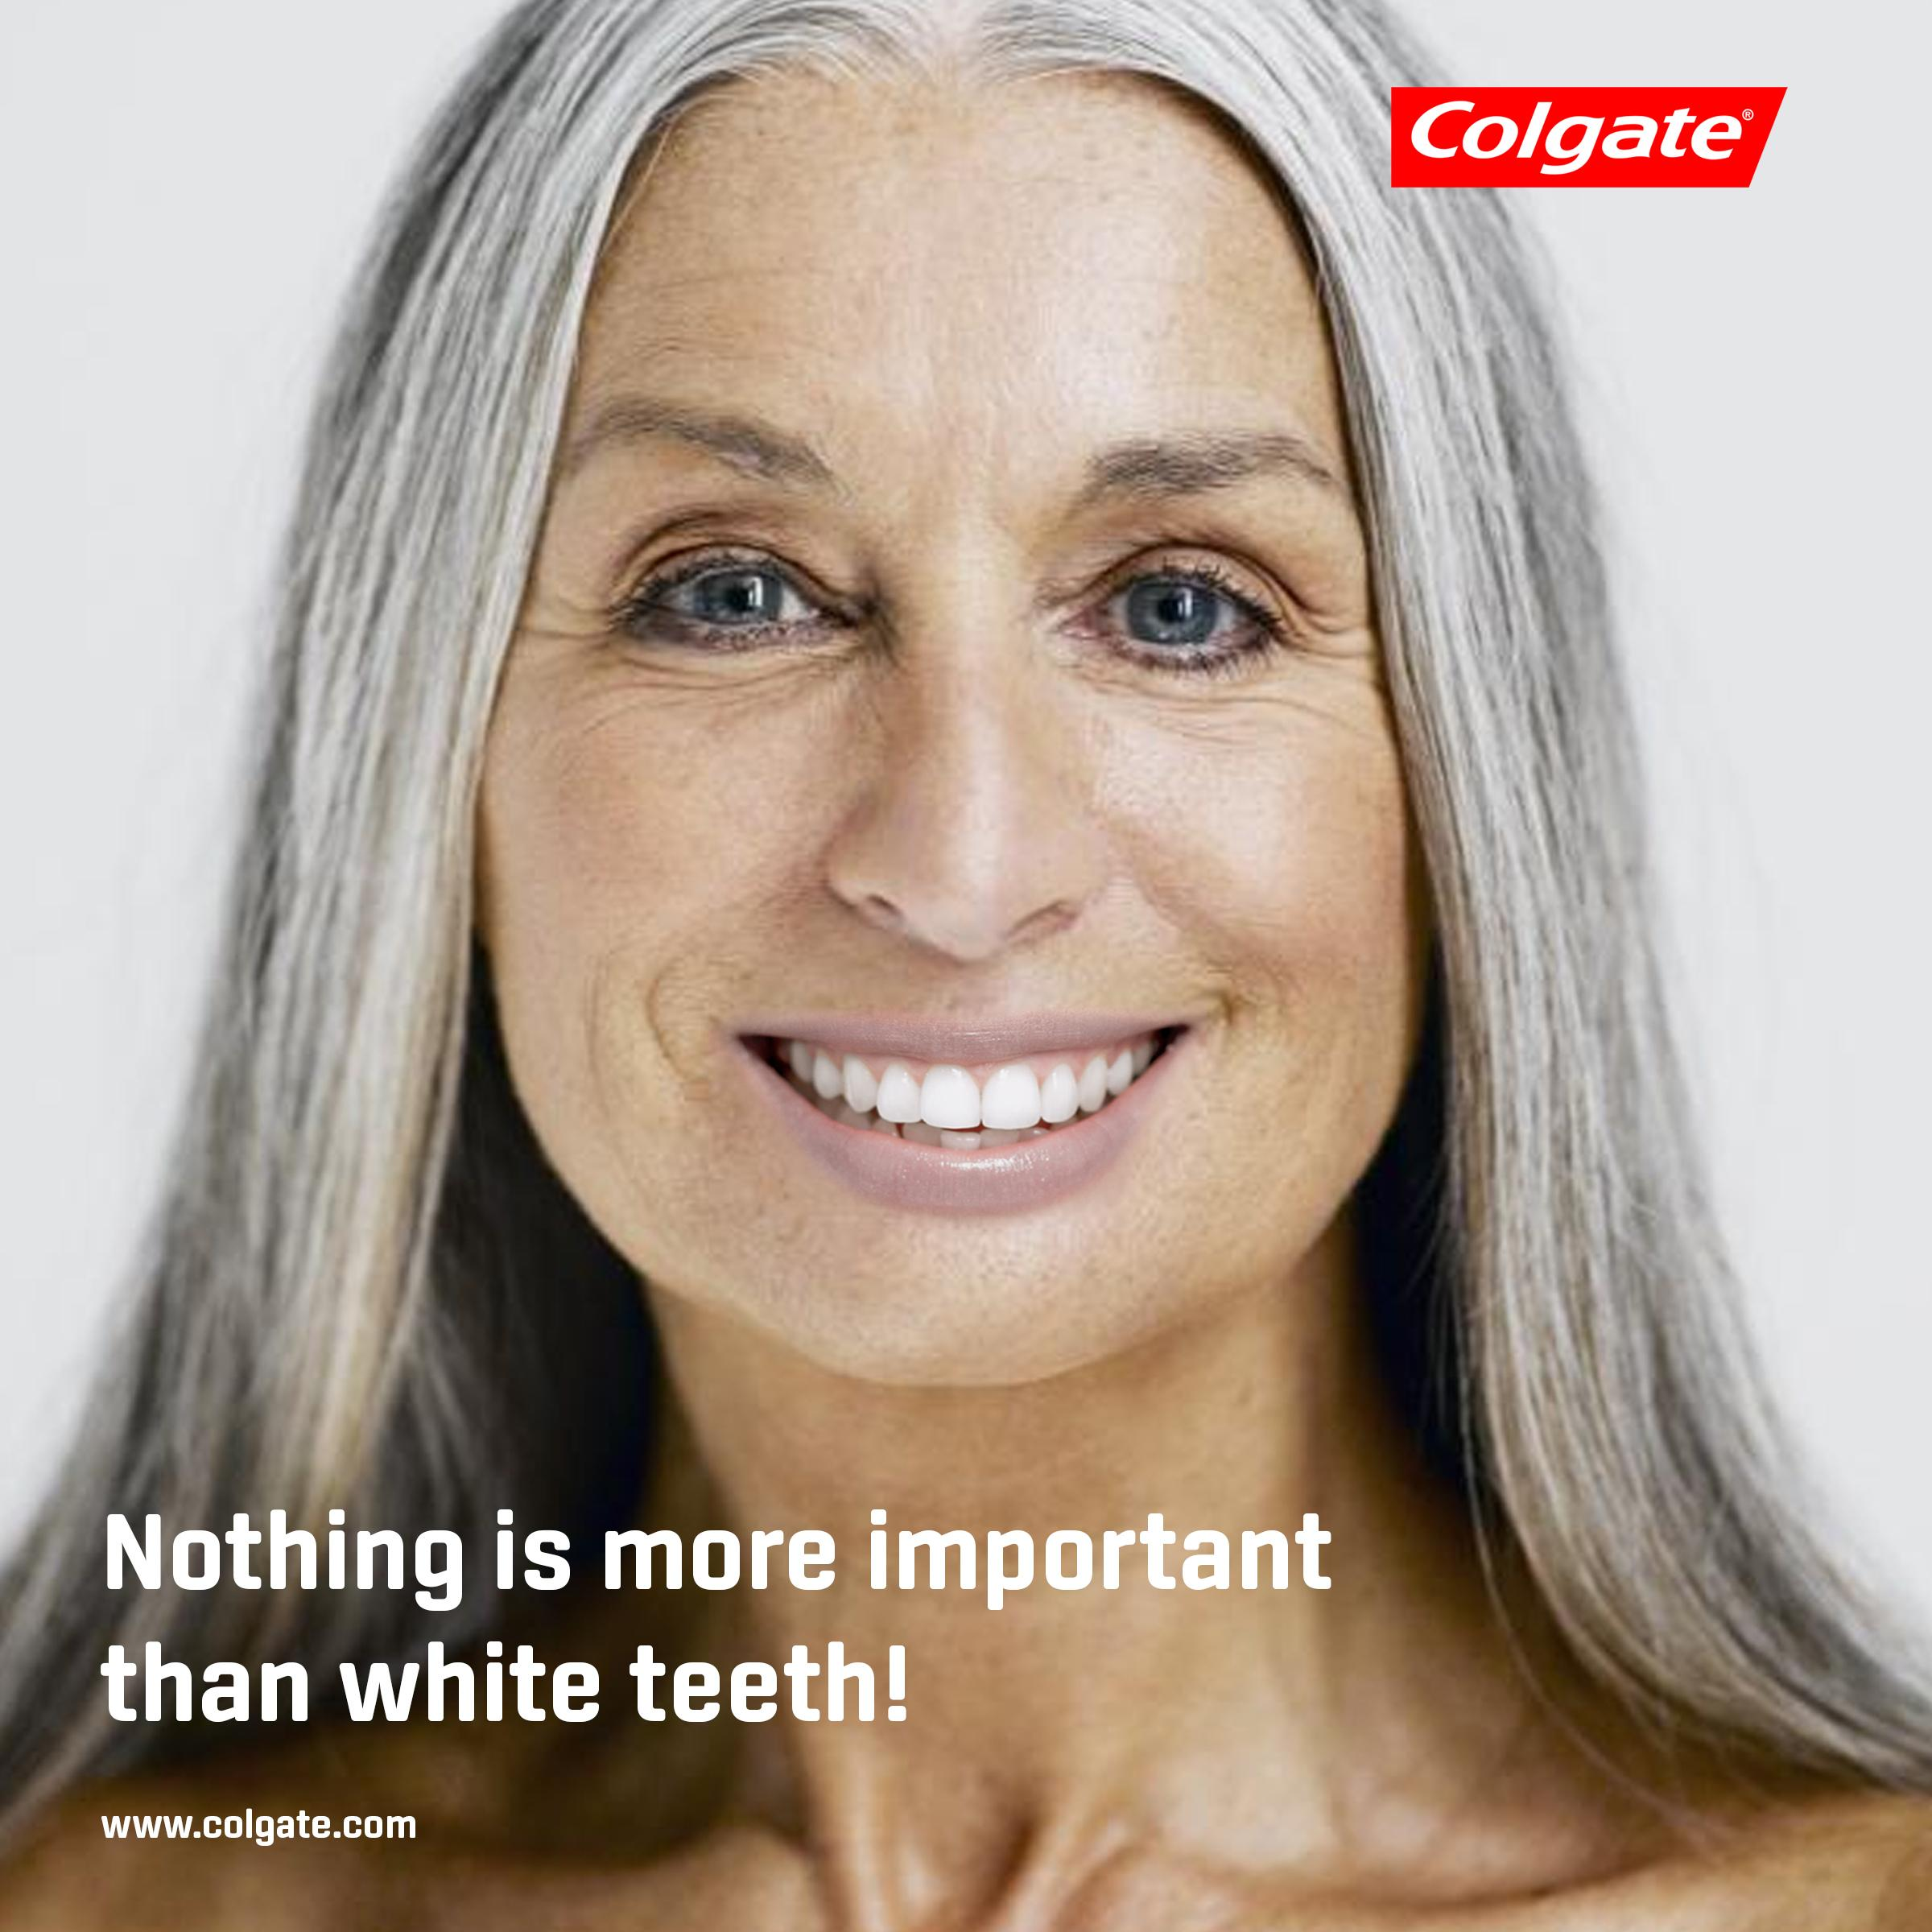 Colgate Print Ad - White Teeth, 2